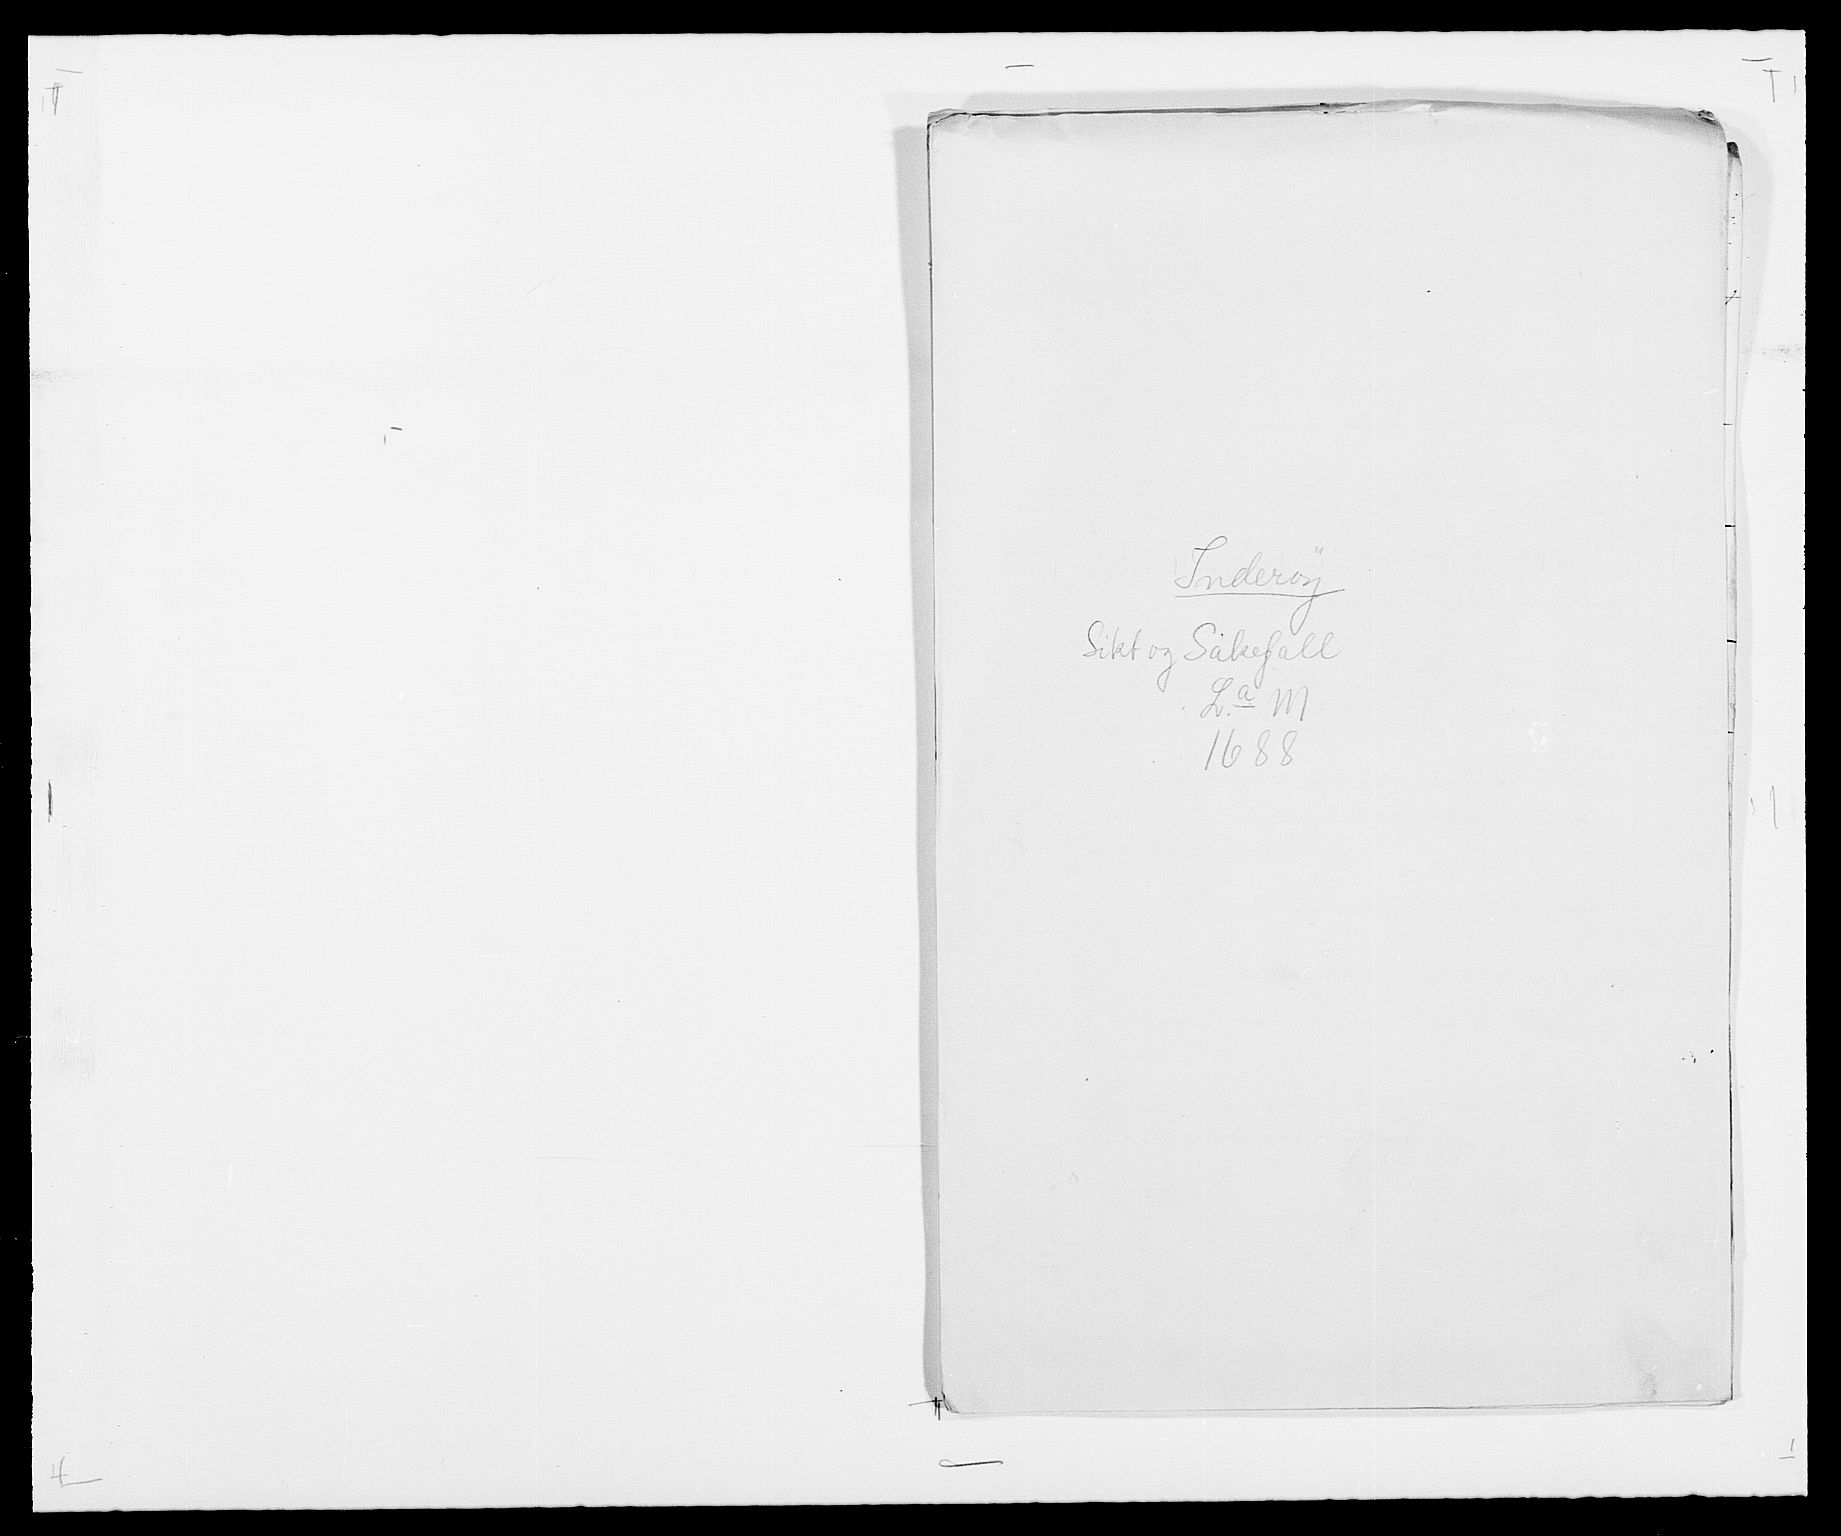 RA, Rentekammeret inntil 1814, Reviderte regnskaper, Fogderegnskap, R63/L4306: Fogderegnskap Inderøy, 1687-1689, s. 335